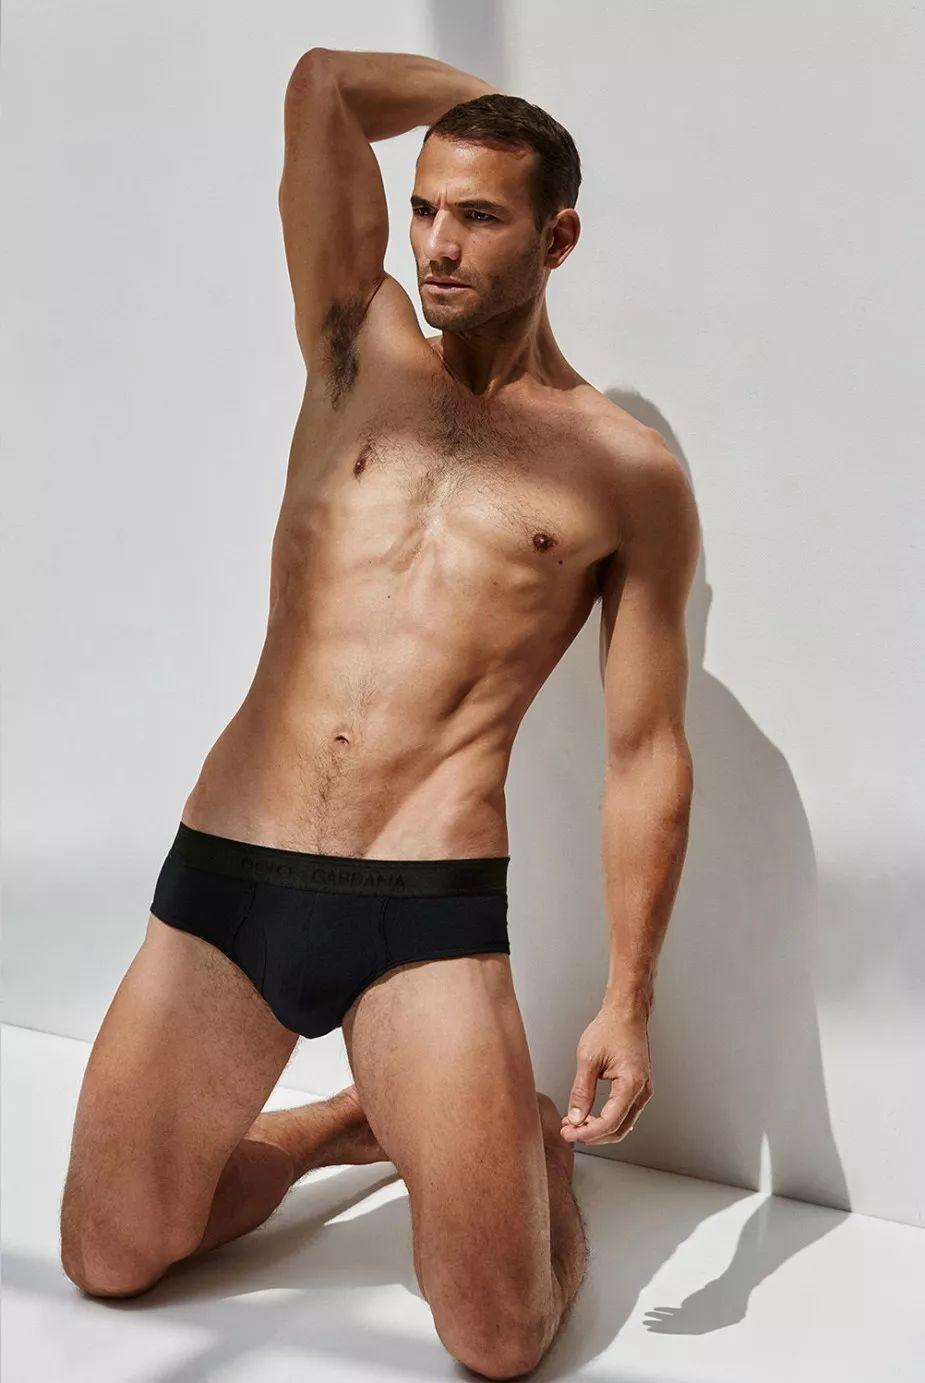 Daddy!米米仙子的前男友Enrique Palacios复出拍内裤大片!